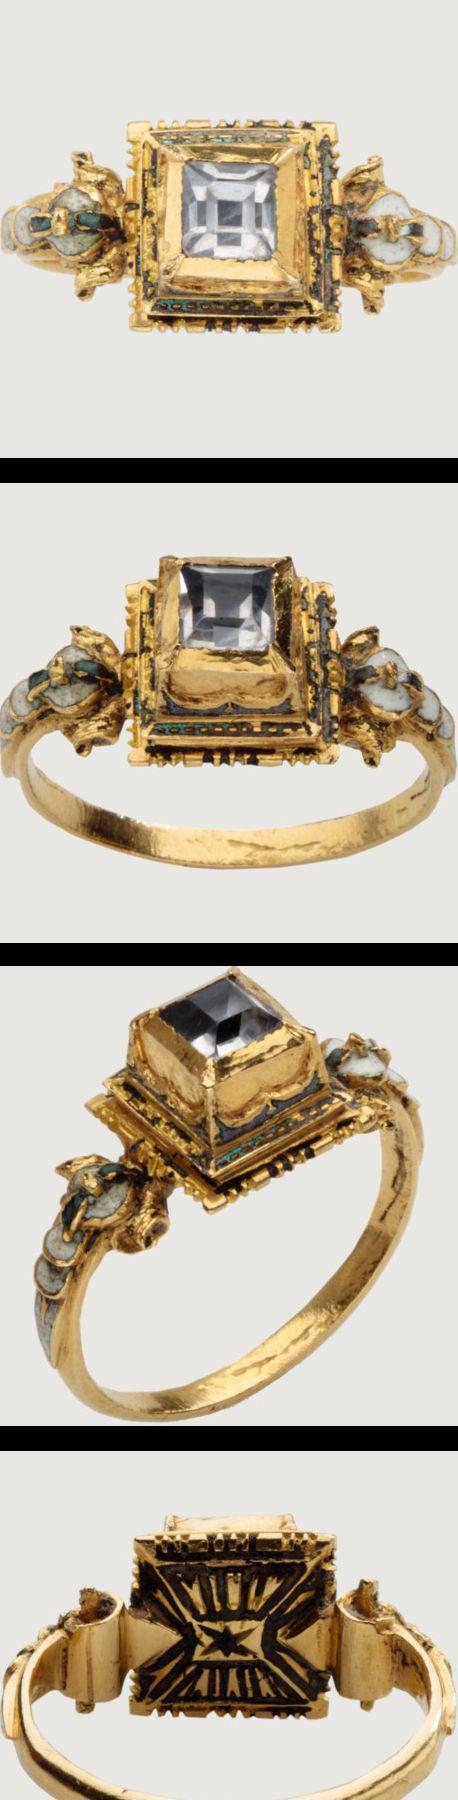 RENAISSANCE MARRIAGE RING Western Europe, c. 1600-1620 Gold, diamond and white enamel.